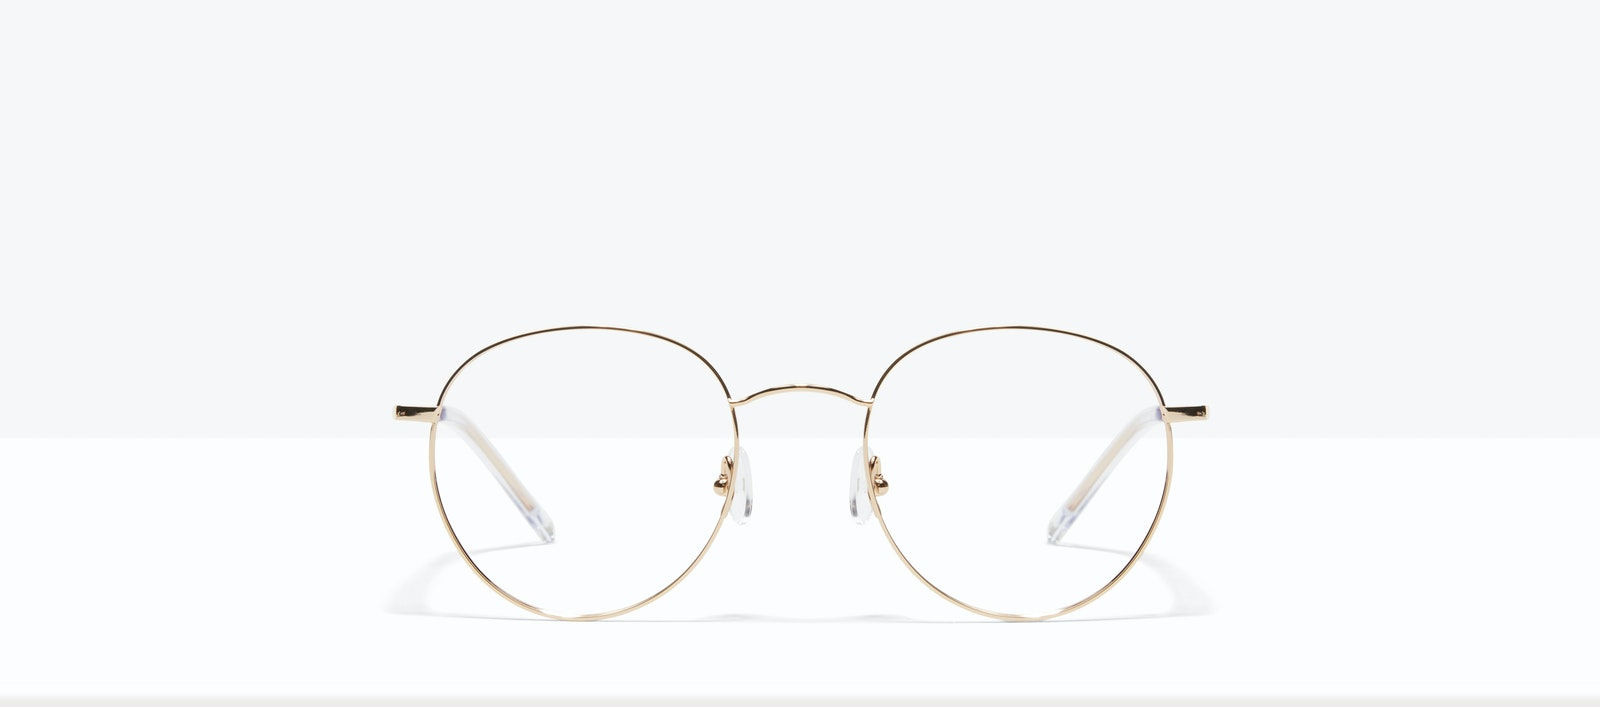 Affordable Fashion Glasses Round Eyeglasses Women Calibre Gold Front